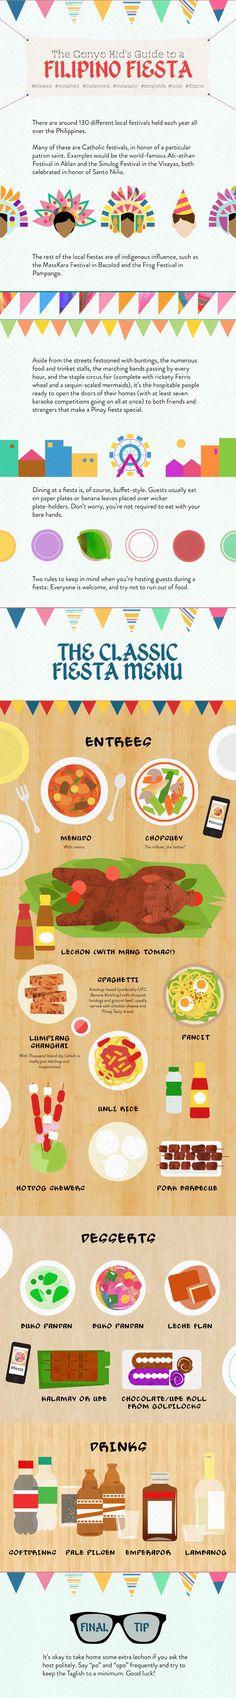 Conyo Kid's Guide to a Filipino Fiesta Philippines Culture, Filipino Culture, Fiesta Theme Party, World Thinking Day, Teaching Career, Filipino Recipes, Filipino Food, Trouble, Tagalog